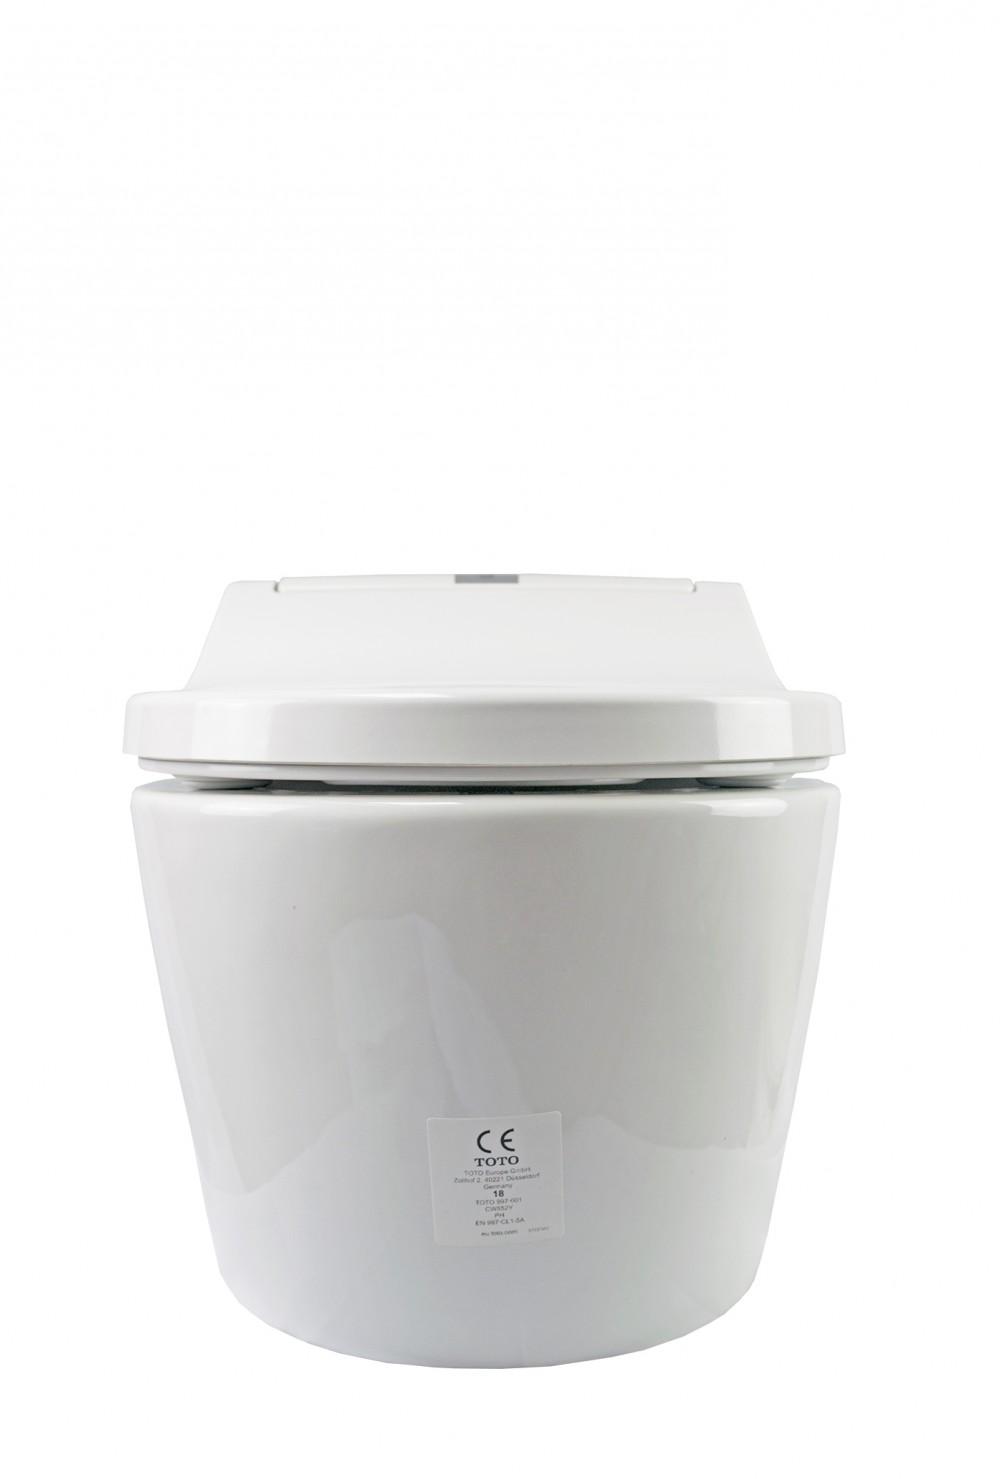 Maro di600 toto RP Spülrandloses dusch WC japanisches